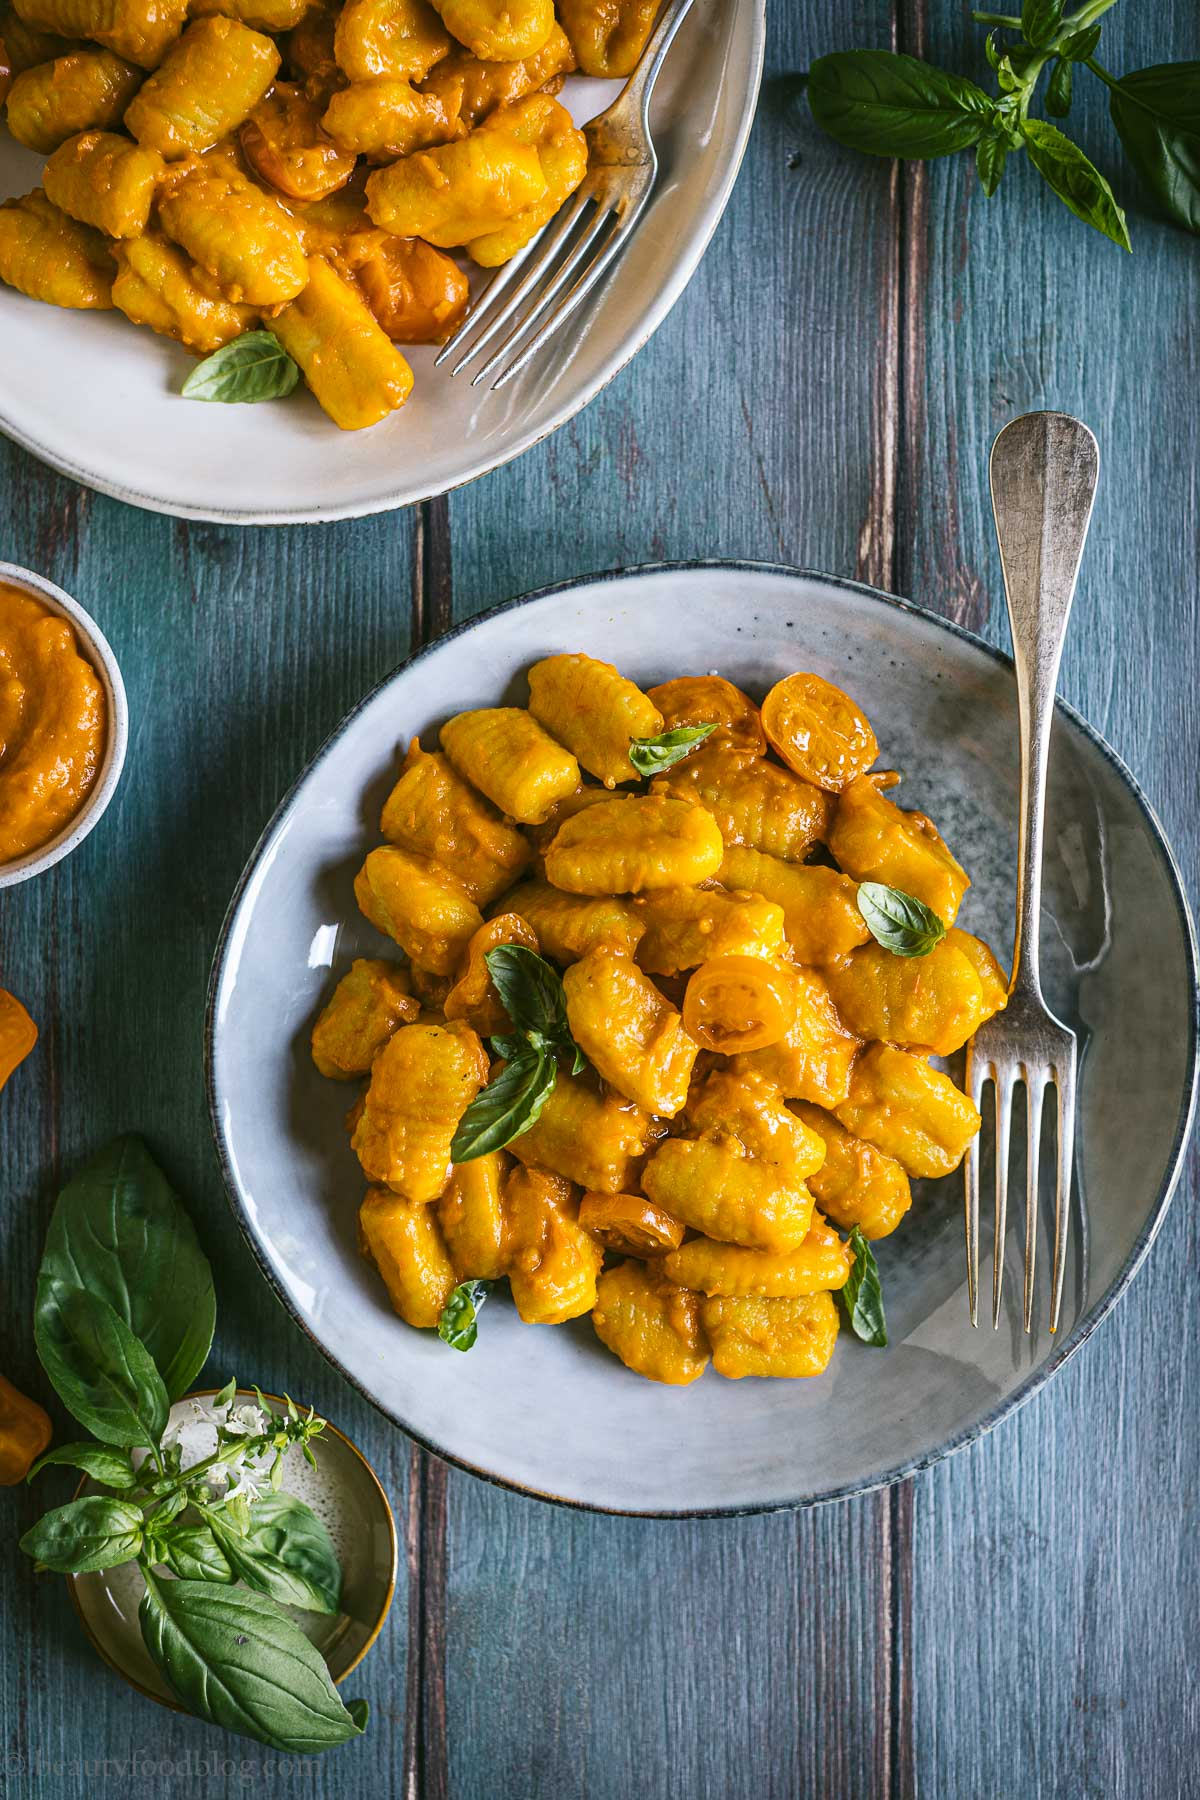 piatto e gnocchi ai pomodorini gialli plate with vegan gnocchi with yellow tomato sauce